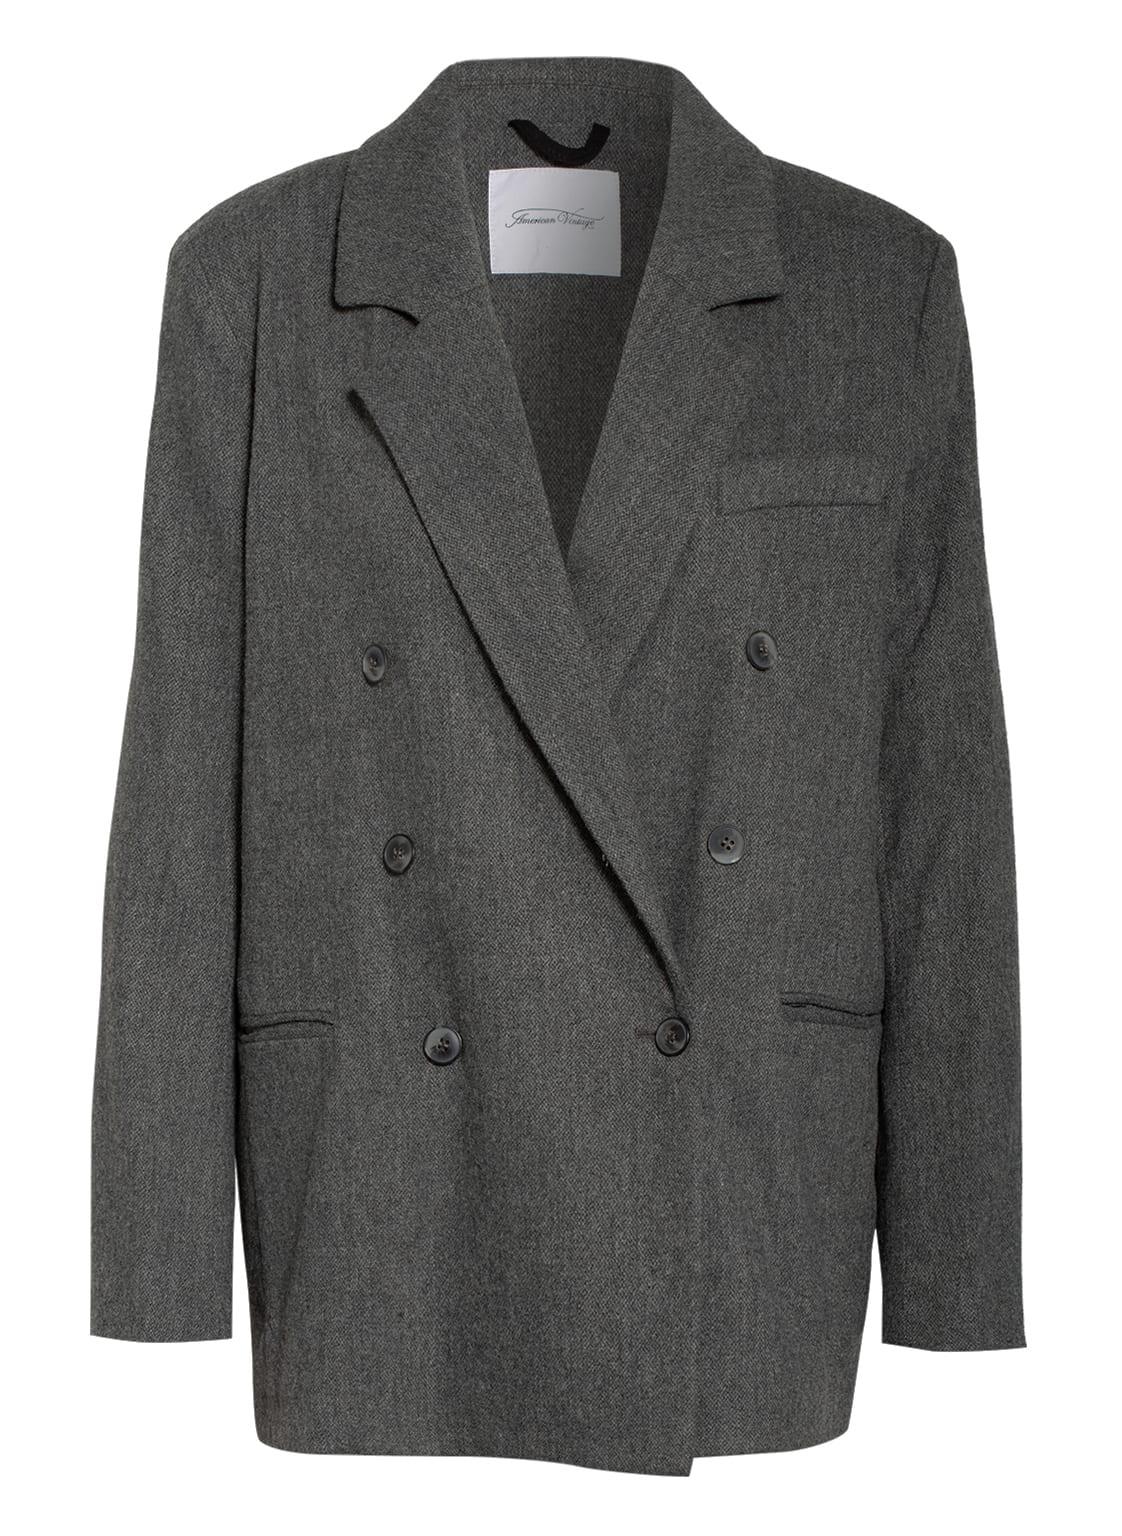 Image of American Vintage Blazer grau